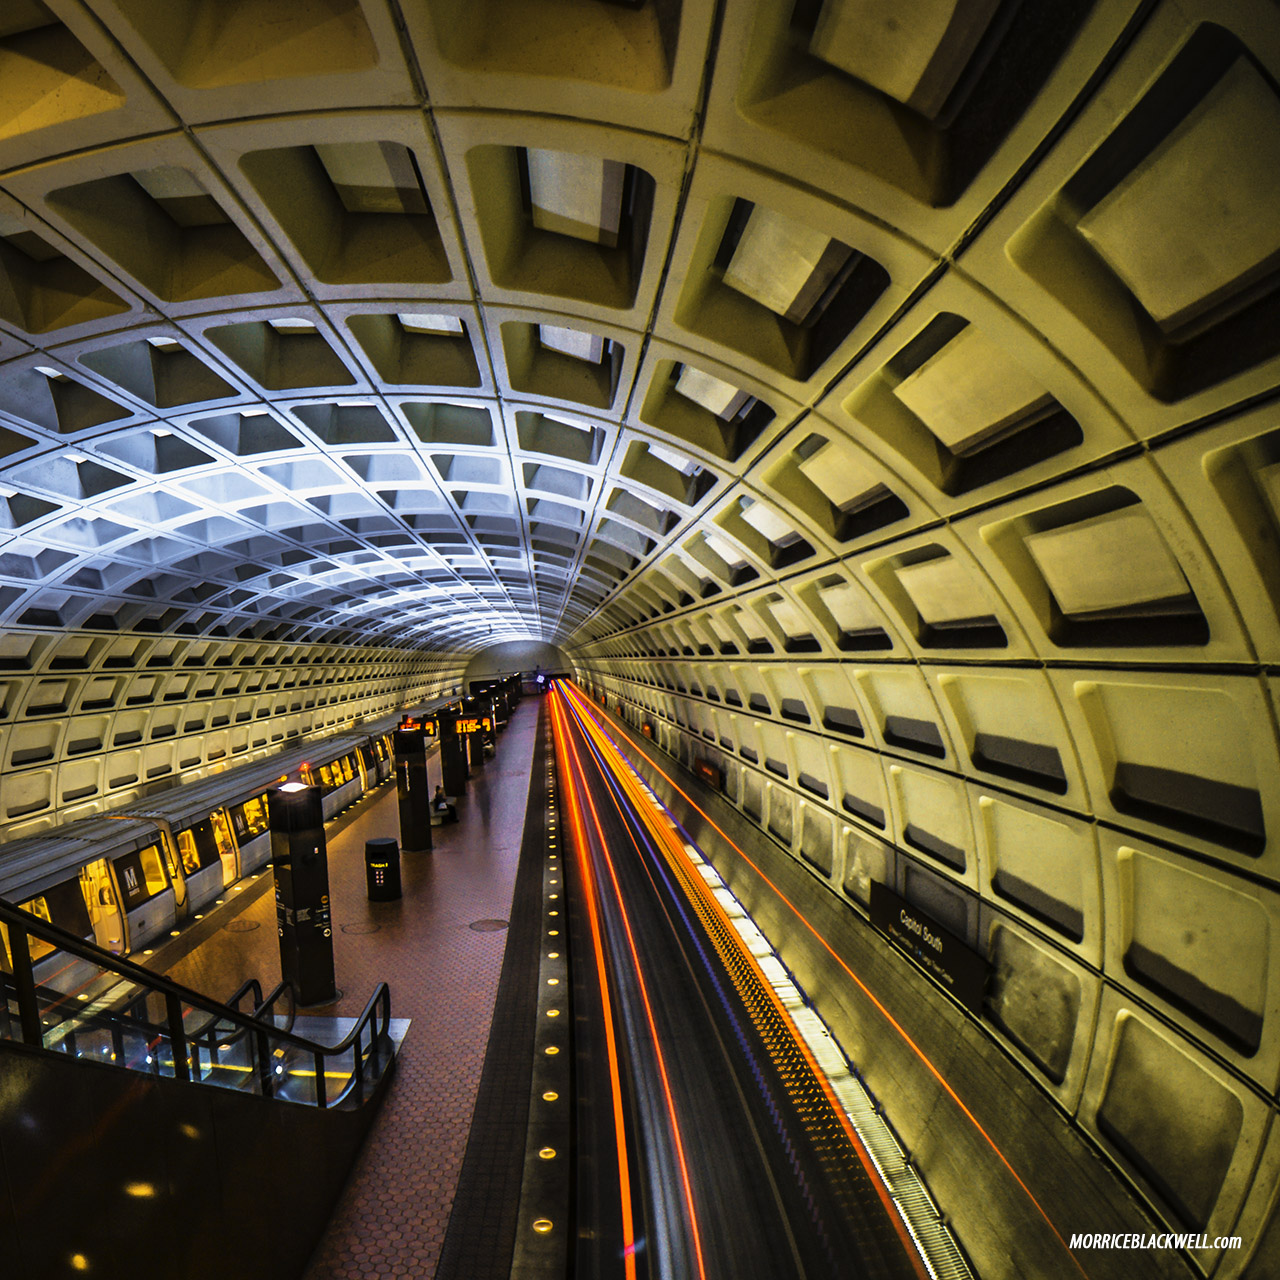 South Capitol Subway Station - 2017 - Washington DC